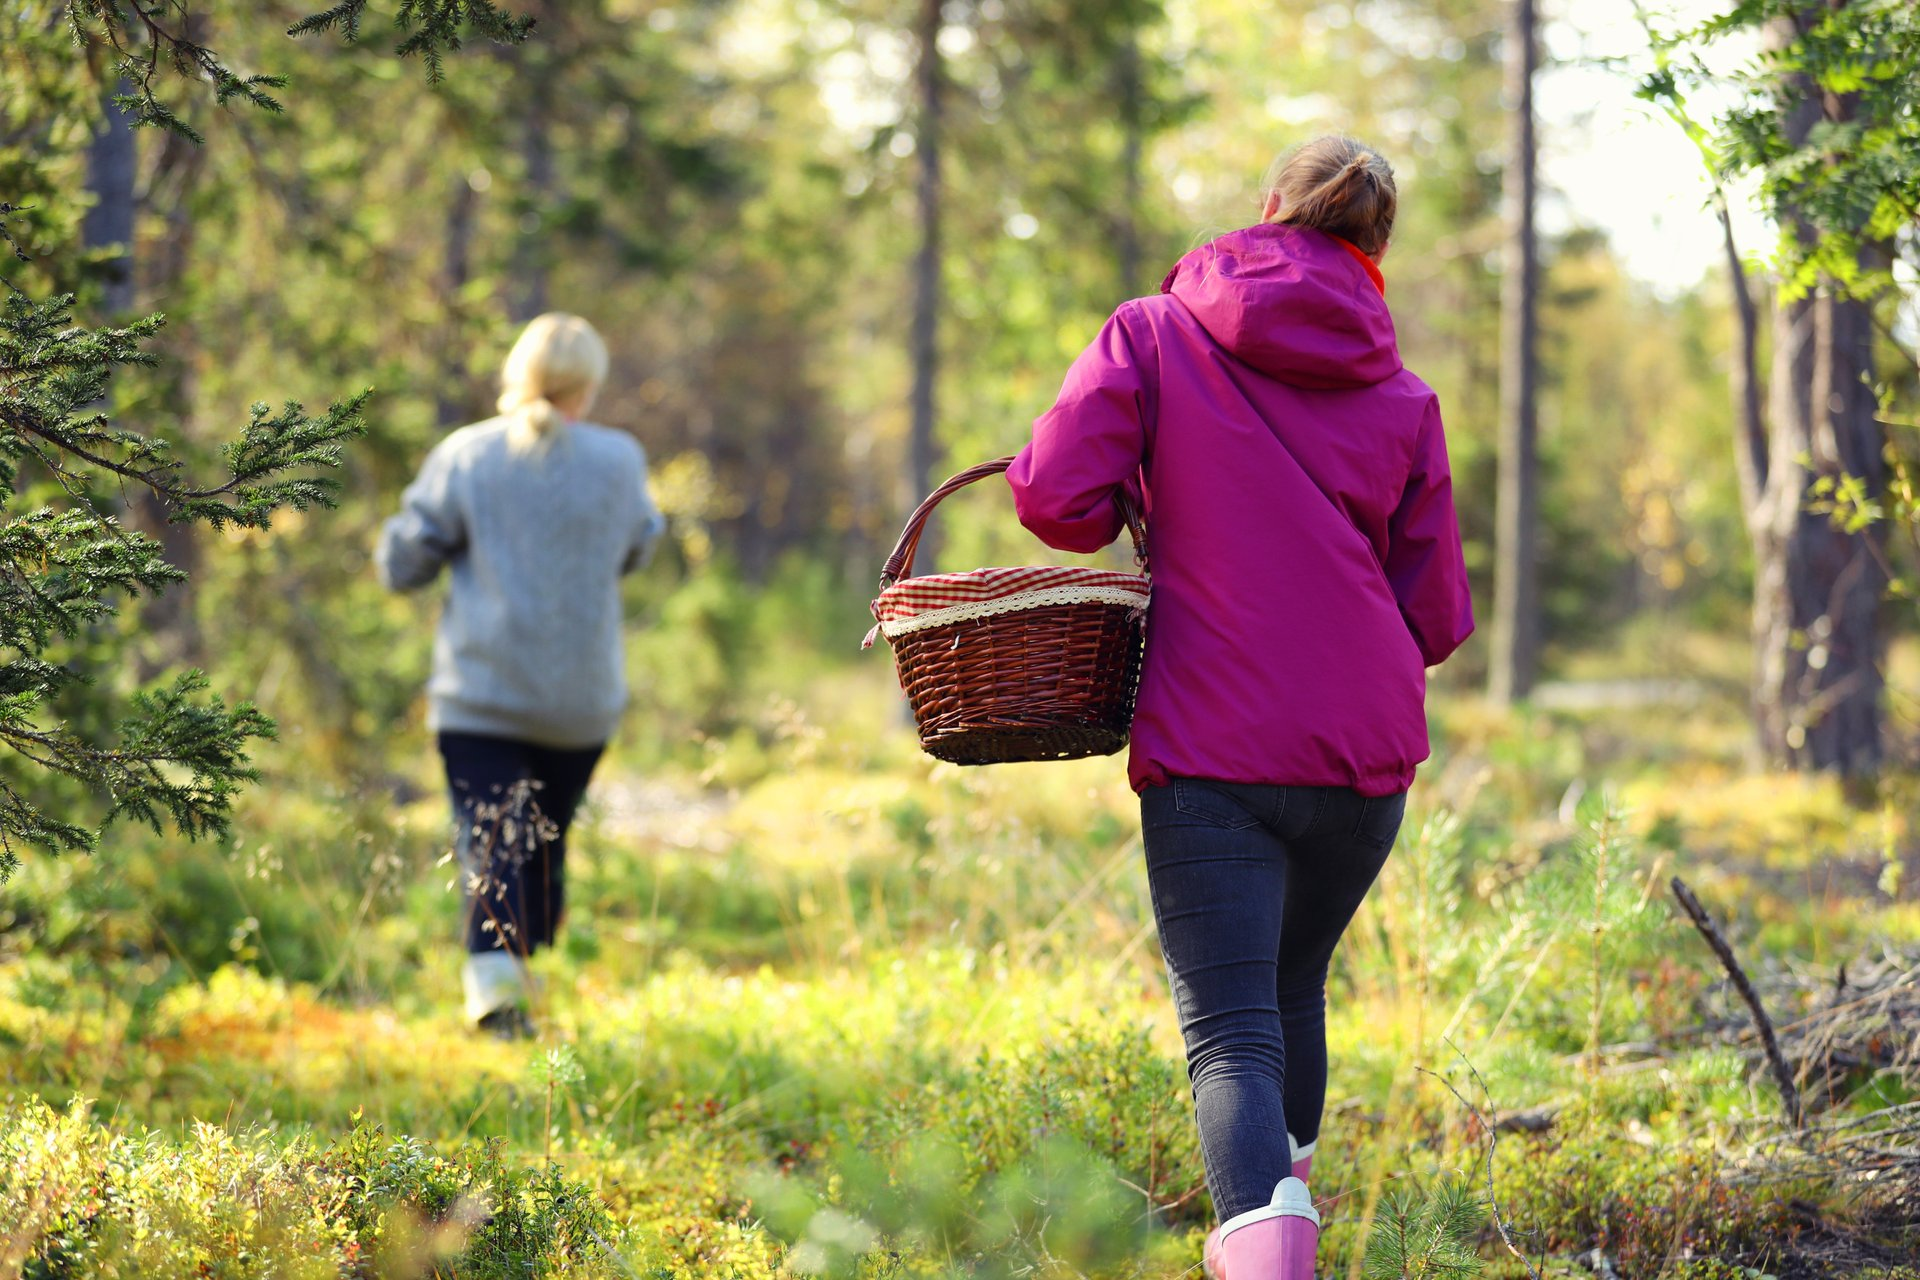 Kuusamo Folk Healers' Gathering in Finland - Best Season 2019